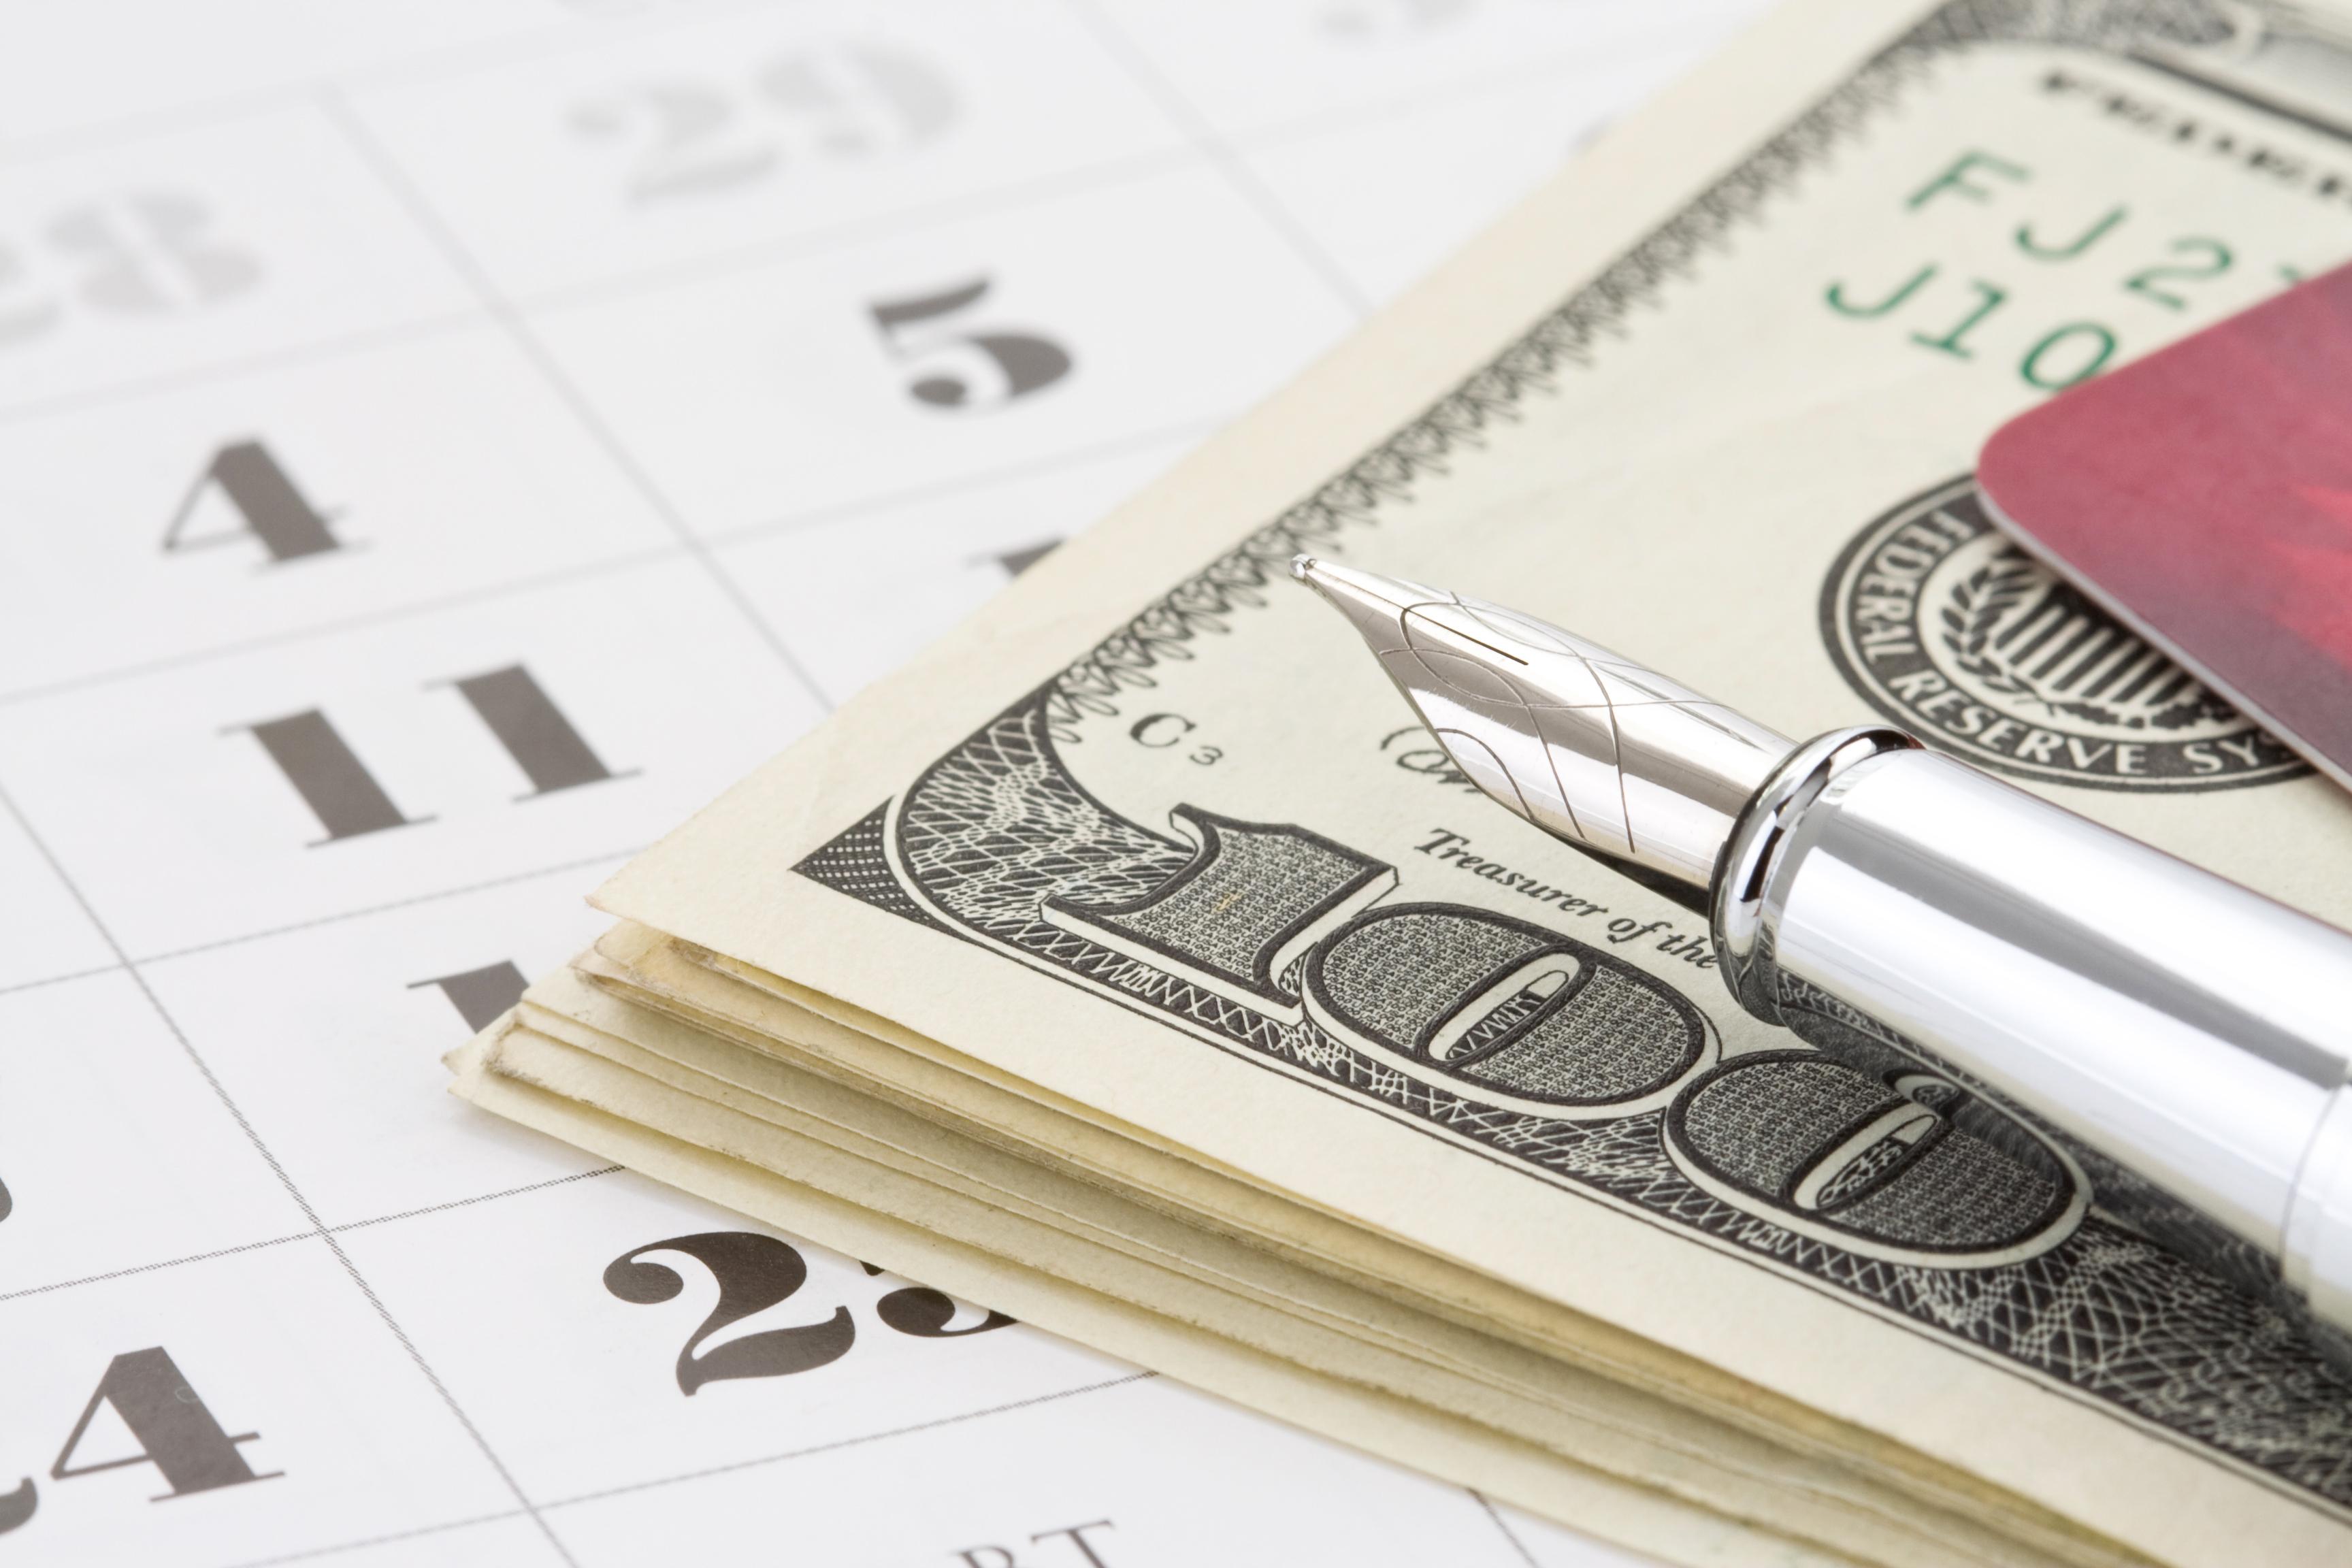 Stack of hundred-dollar bills and a reservoir pen on top of a calendar.